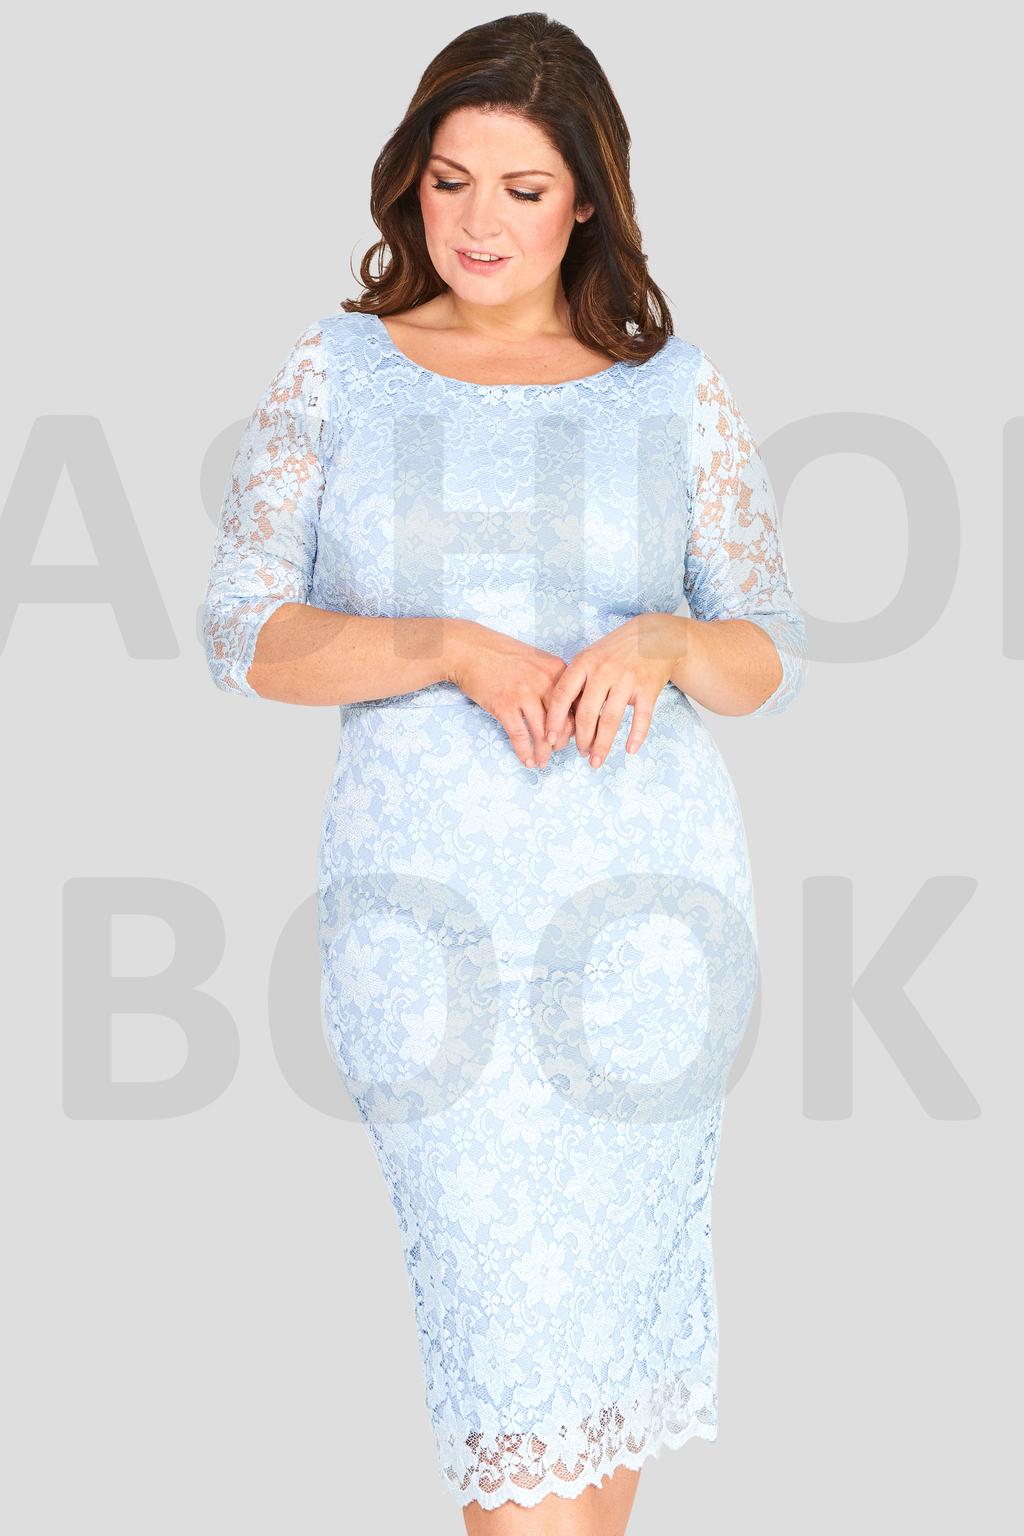 64051963cf Seksowna sukienka z koronki błękitna 44 na Bazarek.pl